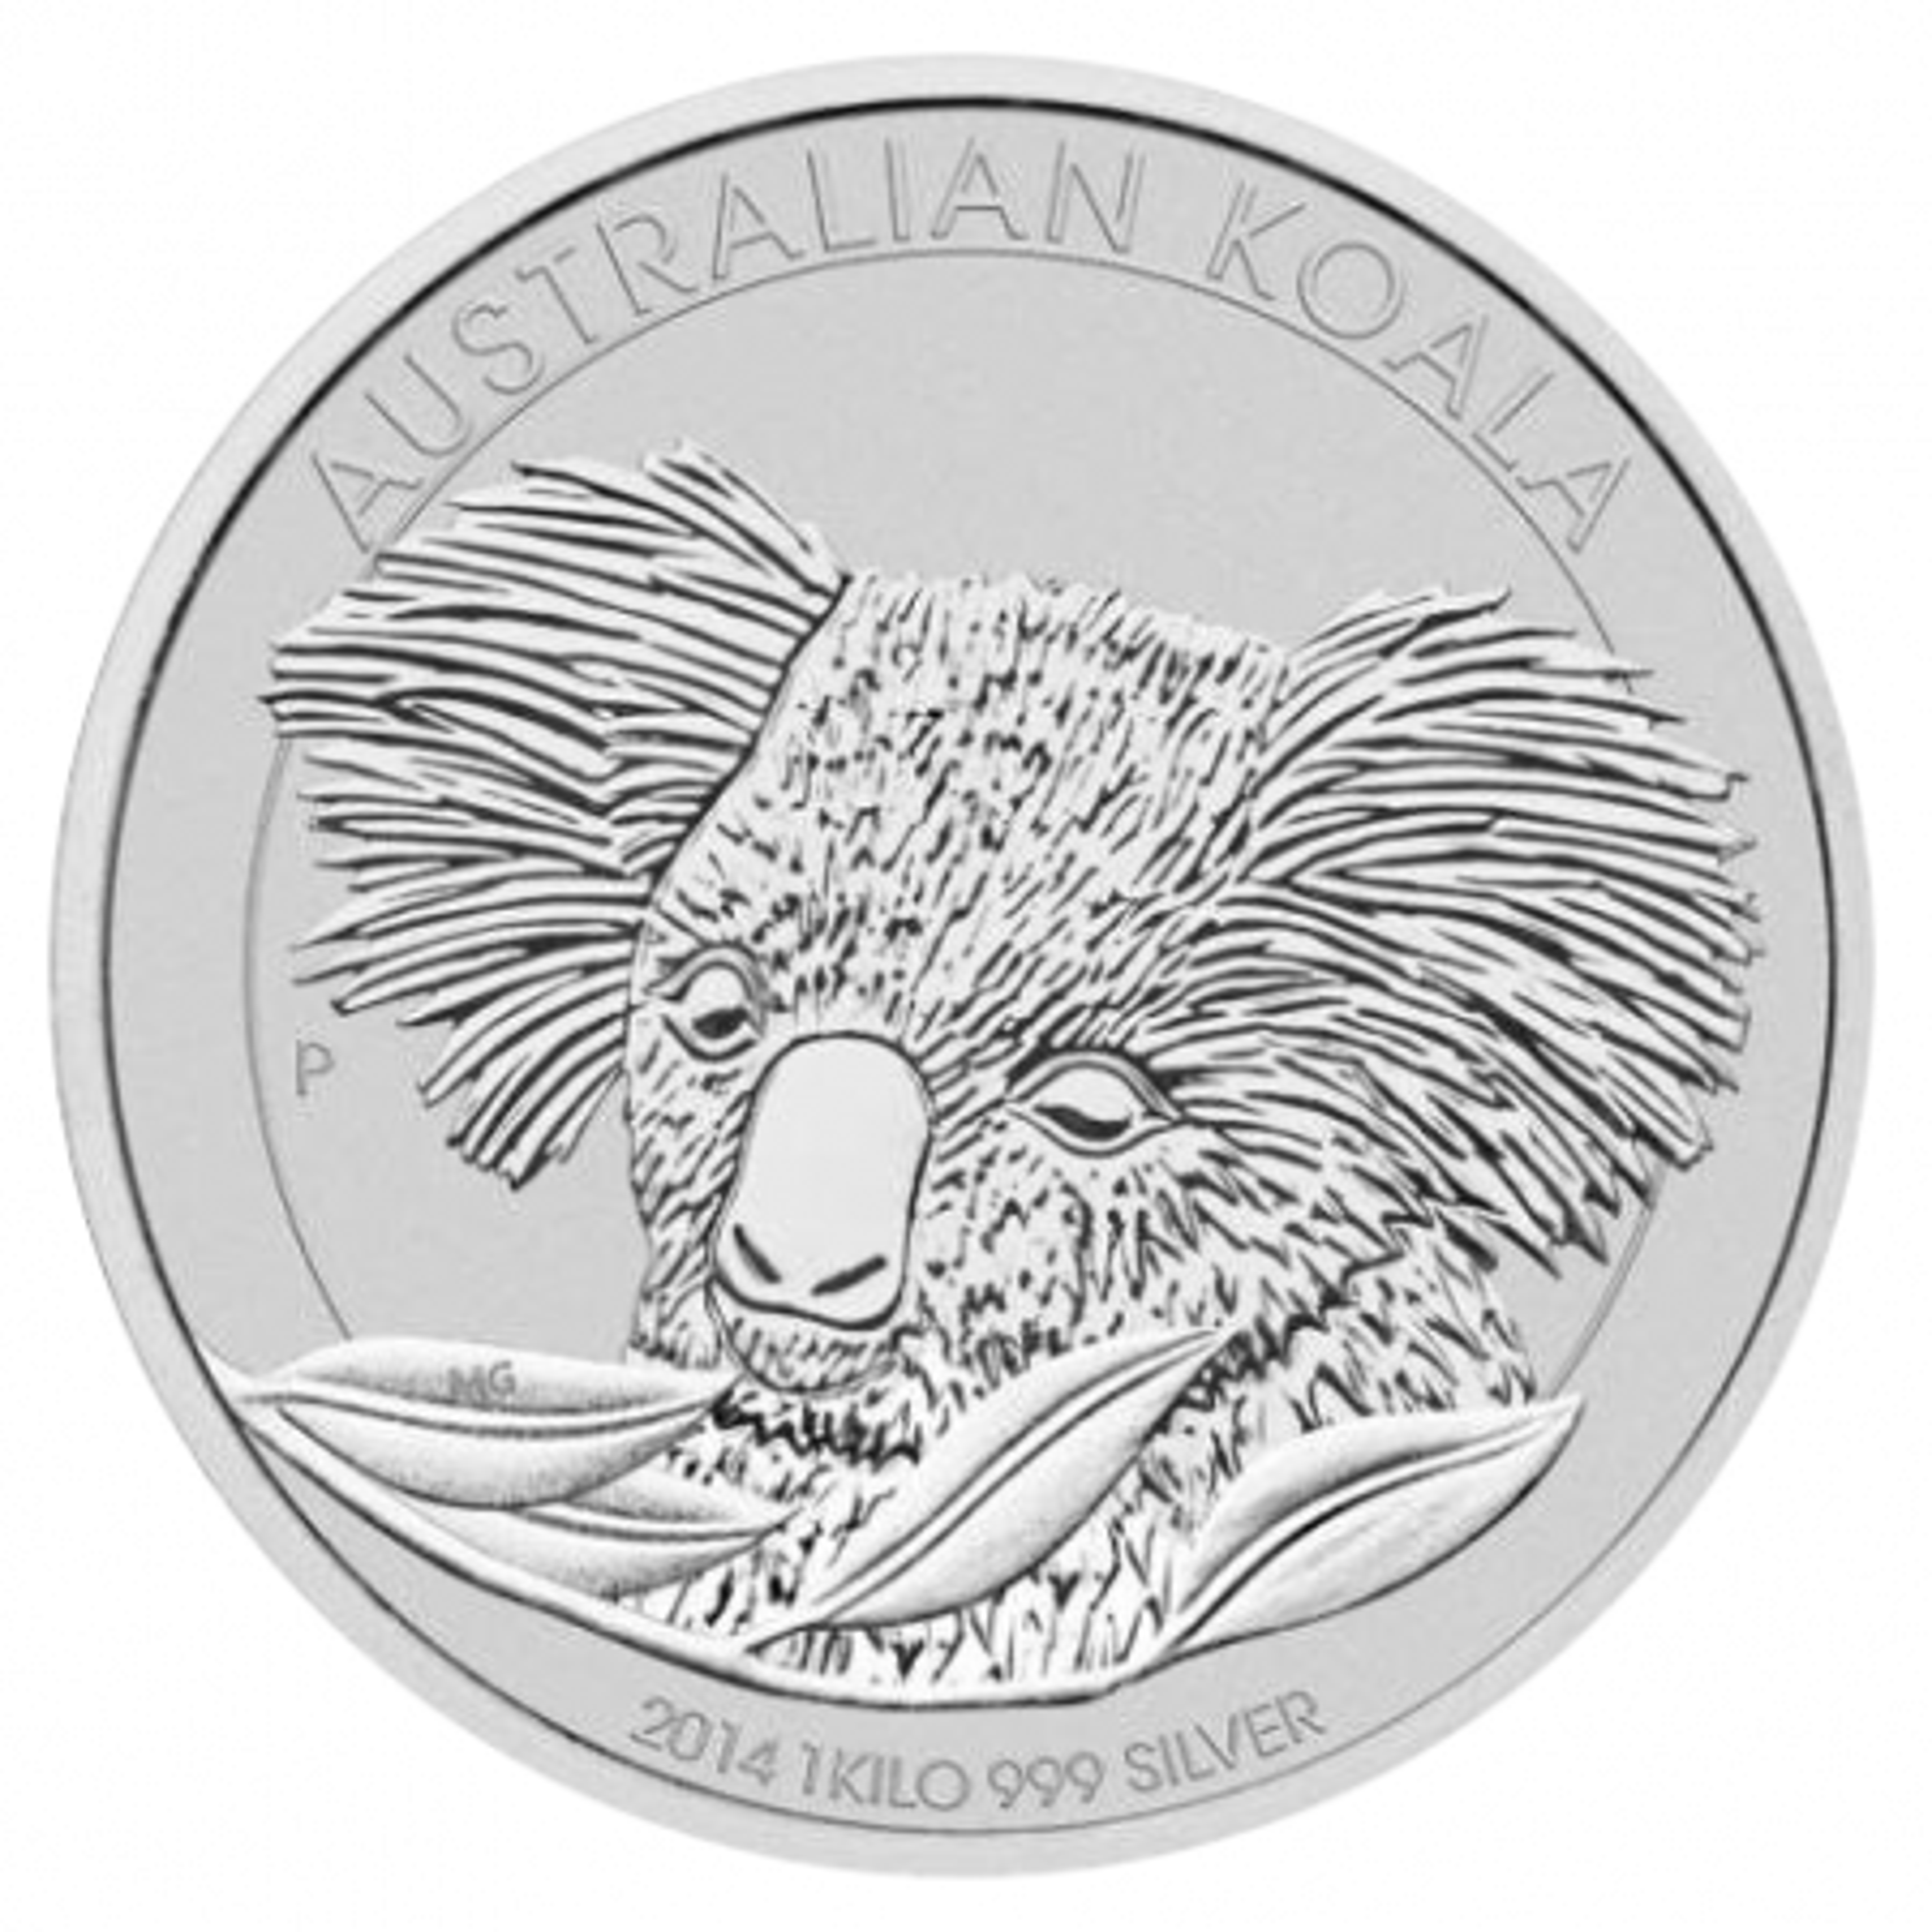 2014 zilver kilo Koala munt